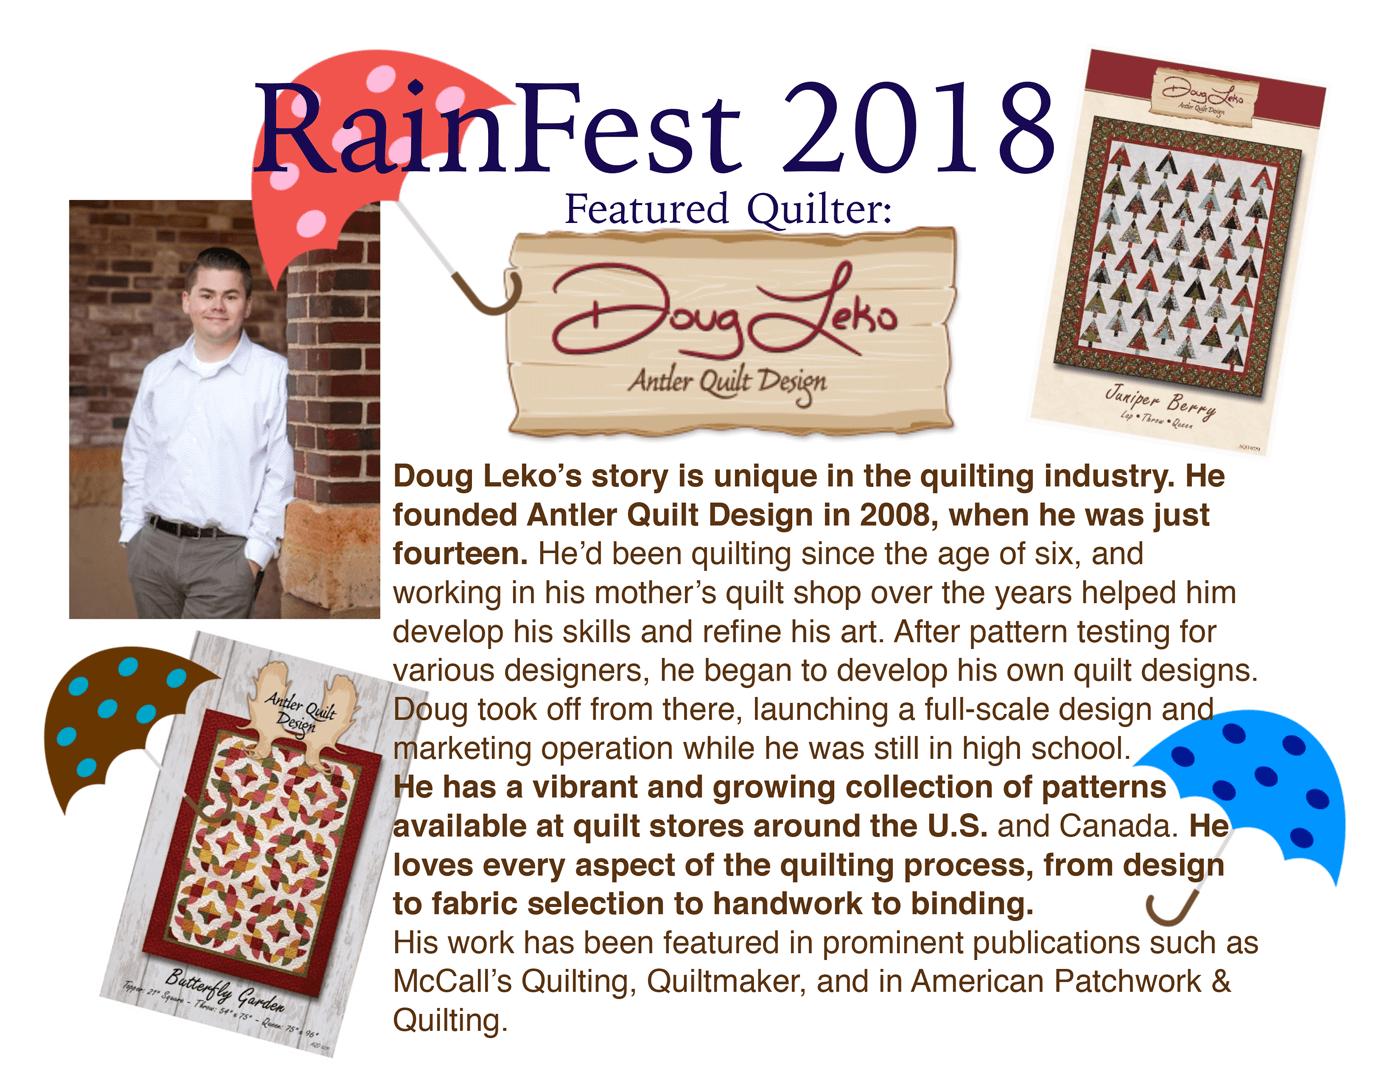 Rainfest 2018 Preview info